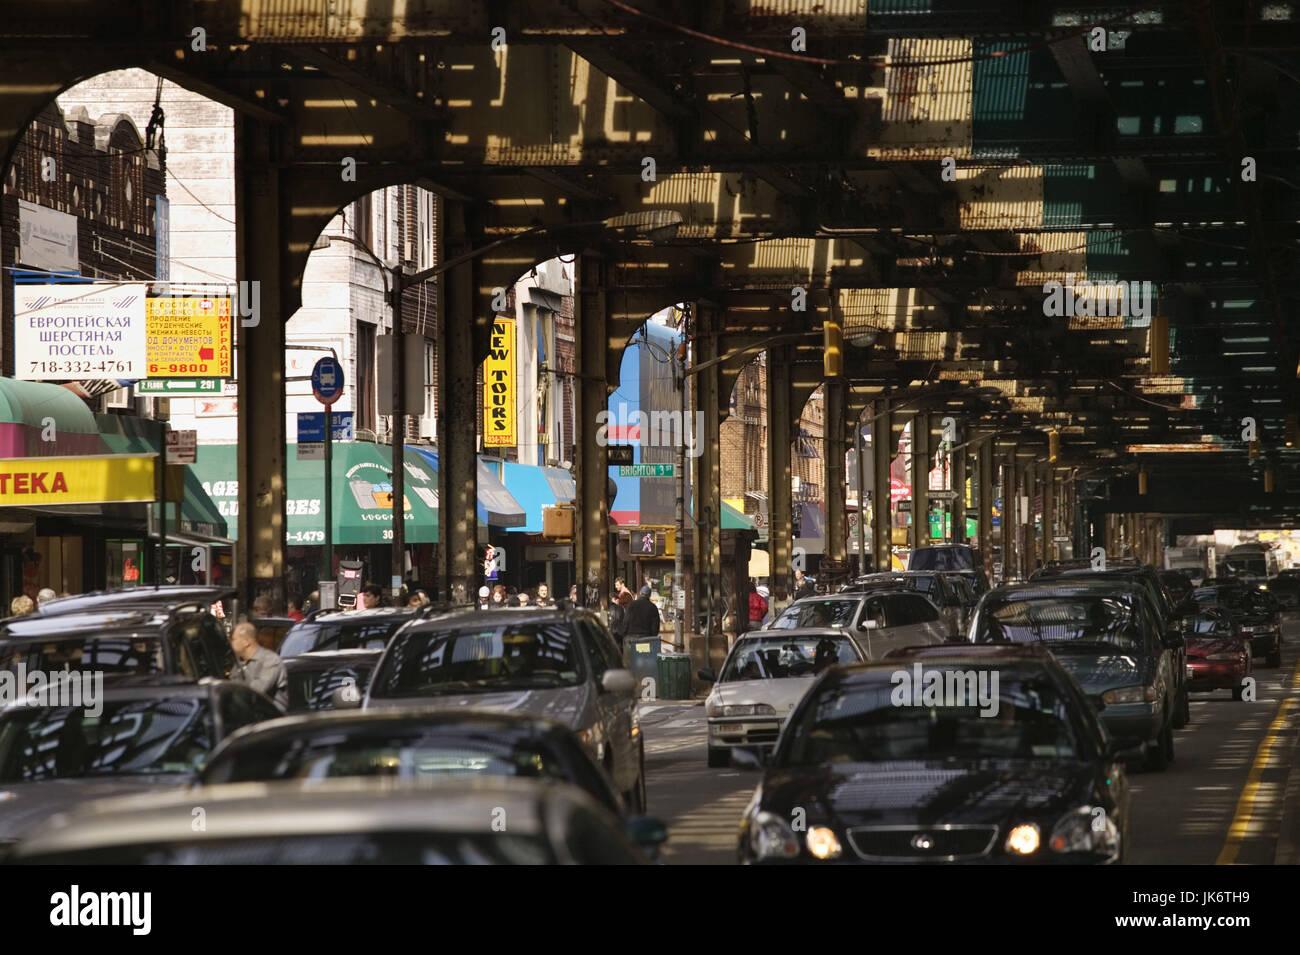 USA, New York City, Brooklyn, Brighton Beach Avenue, Straßenszene  Amerika, Nordamerika, Großstadt, Weltstadt, - Stock Image